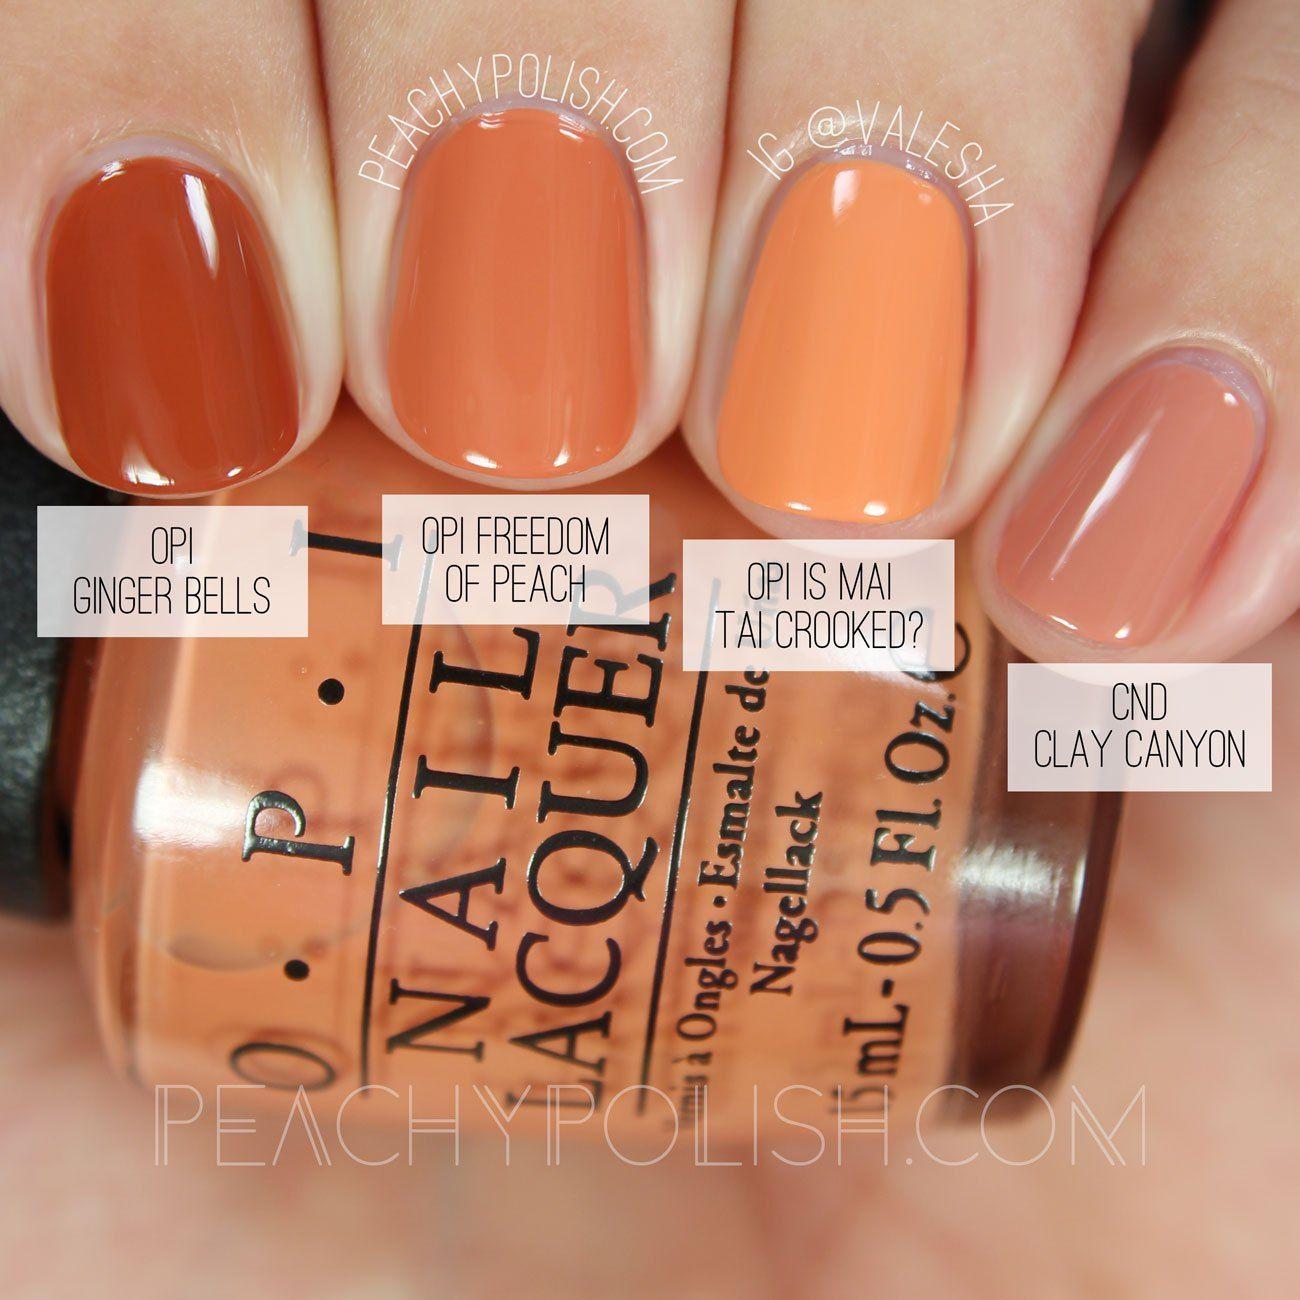 Opi Freedom Of Peach Washington D C Collection Comparisons Peachy Polish Fall Nail Designs